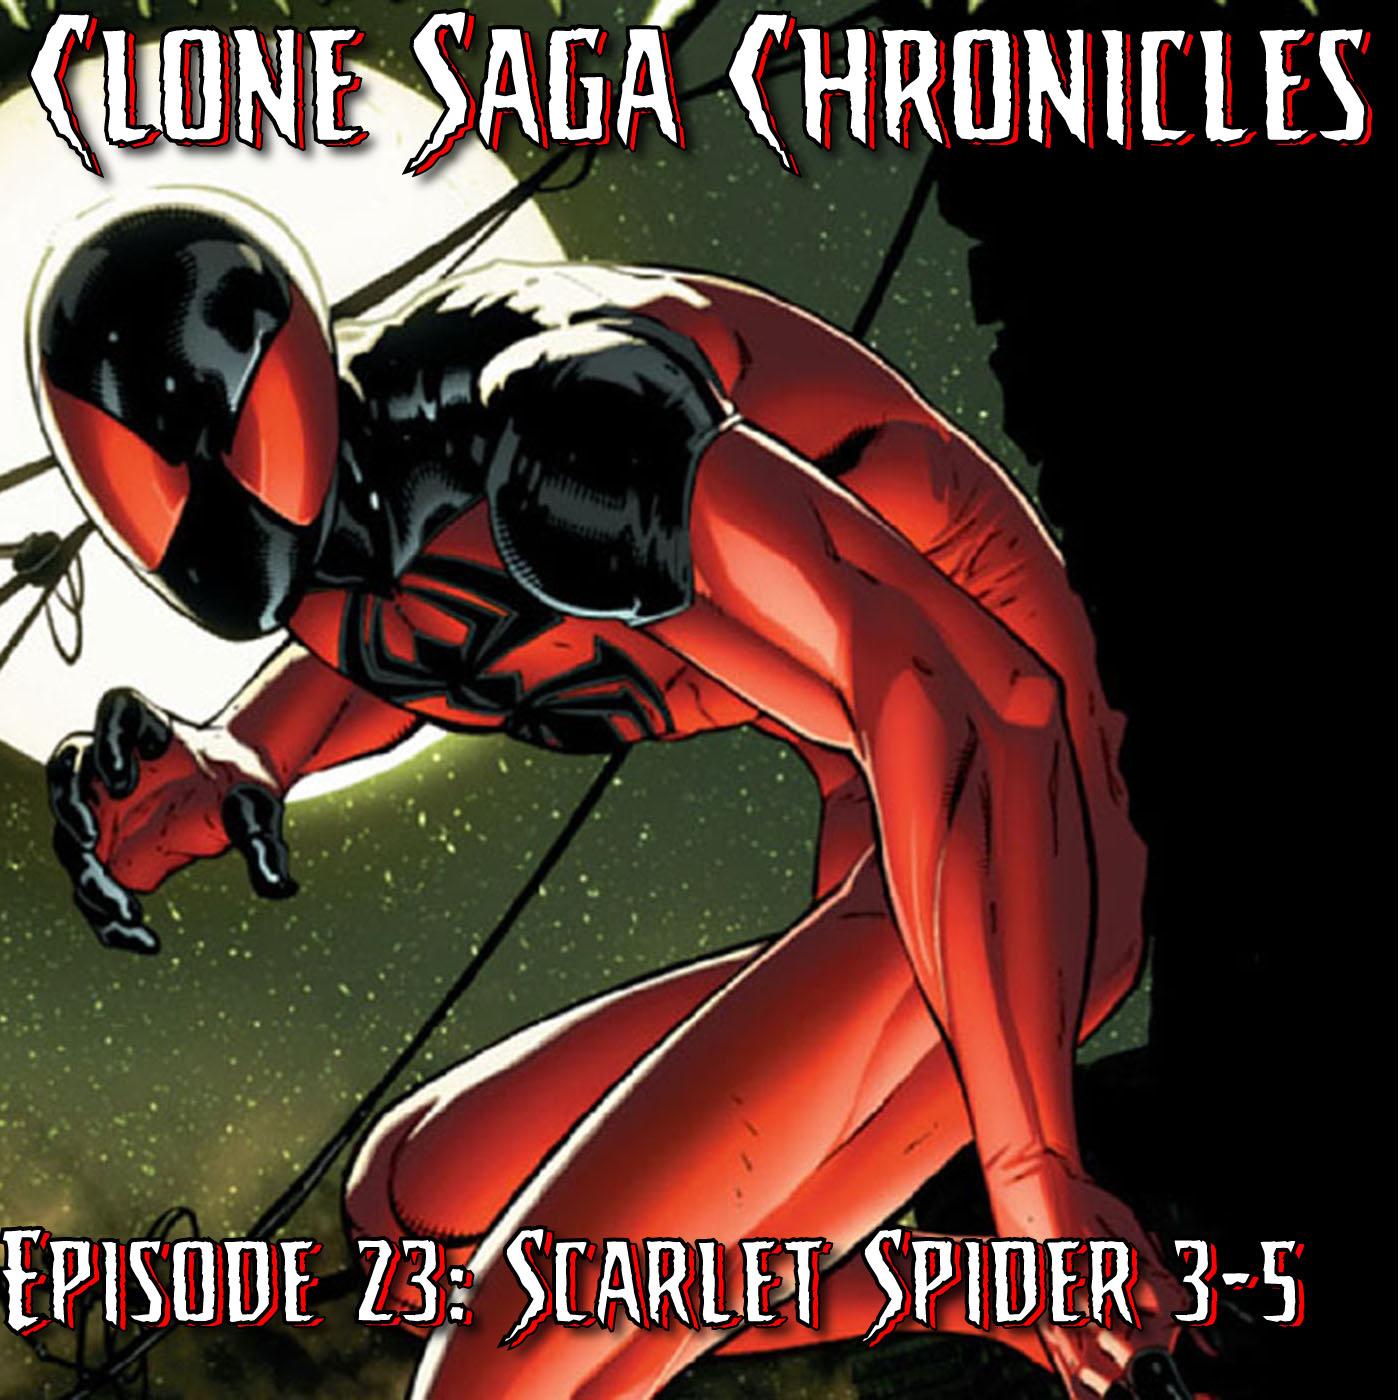 CSC Episode 23: Scarlet Spider (Vol II) #3-5 (Mar/Apr/May 2012)